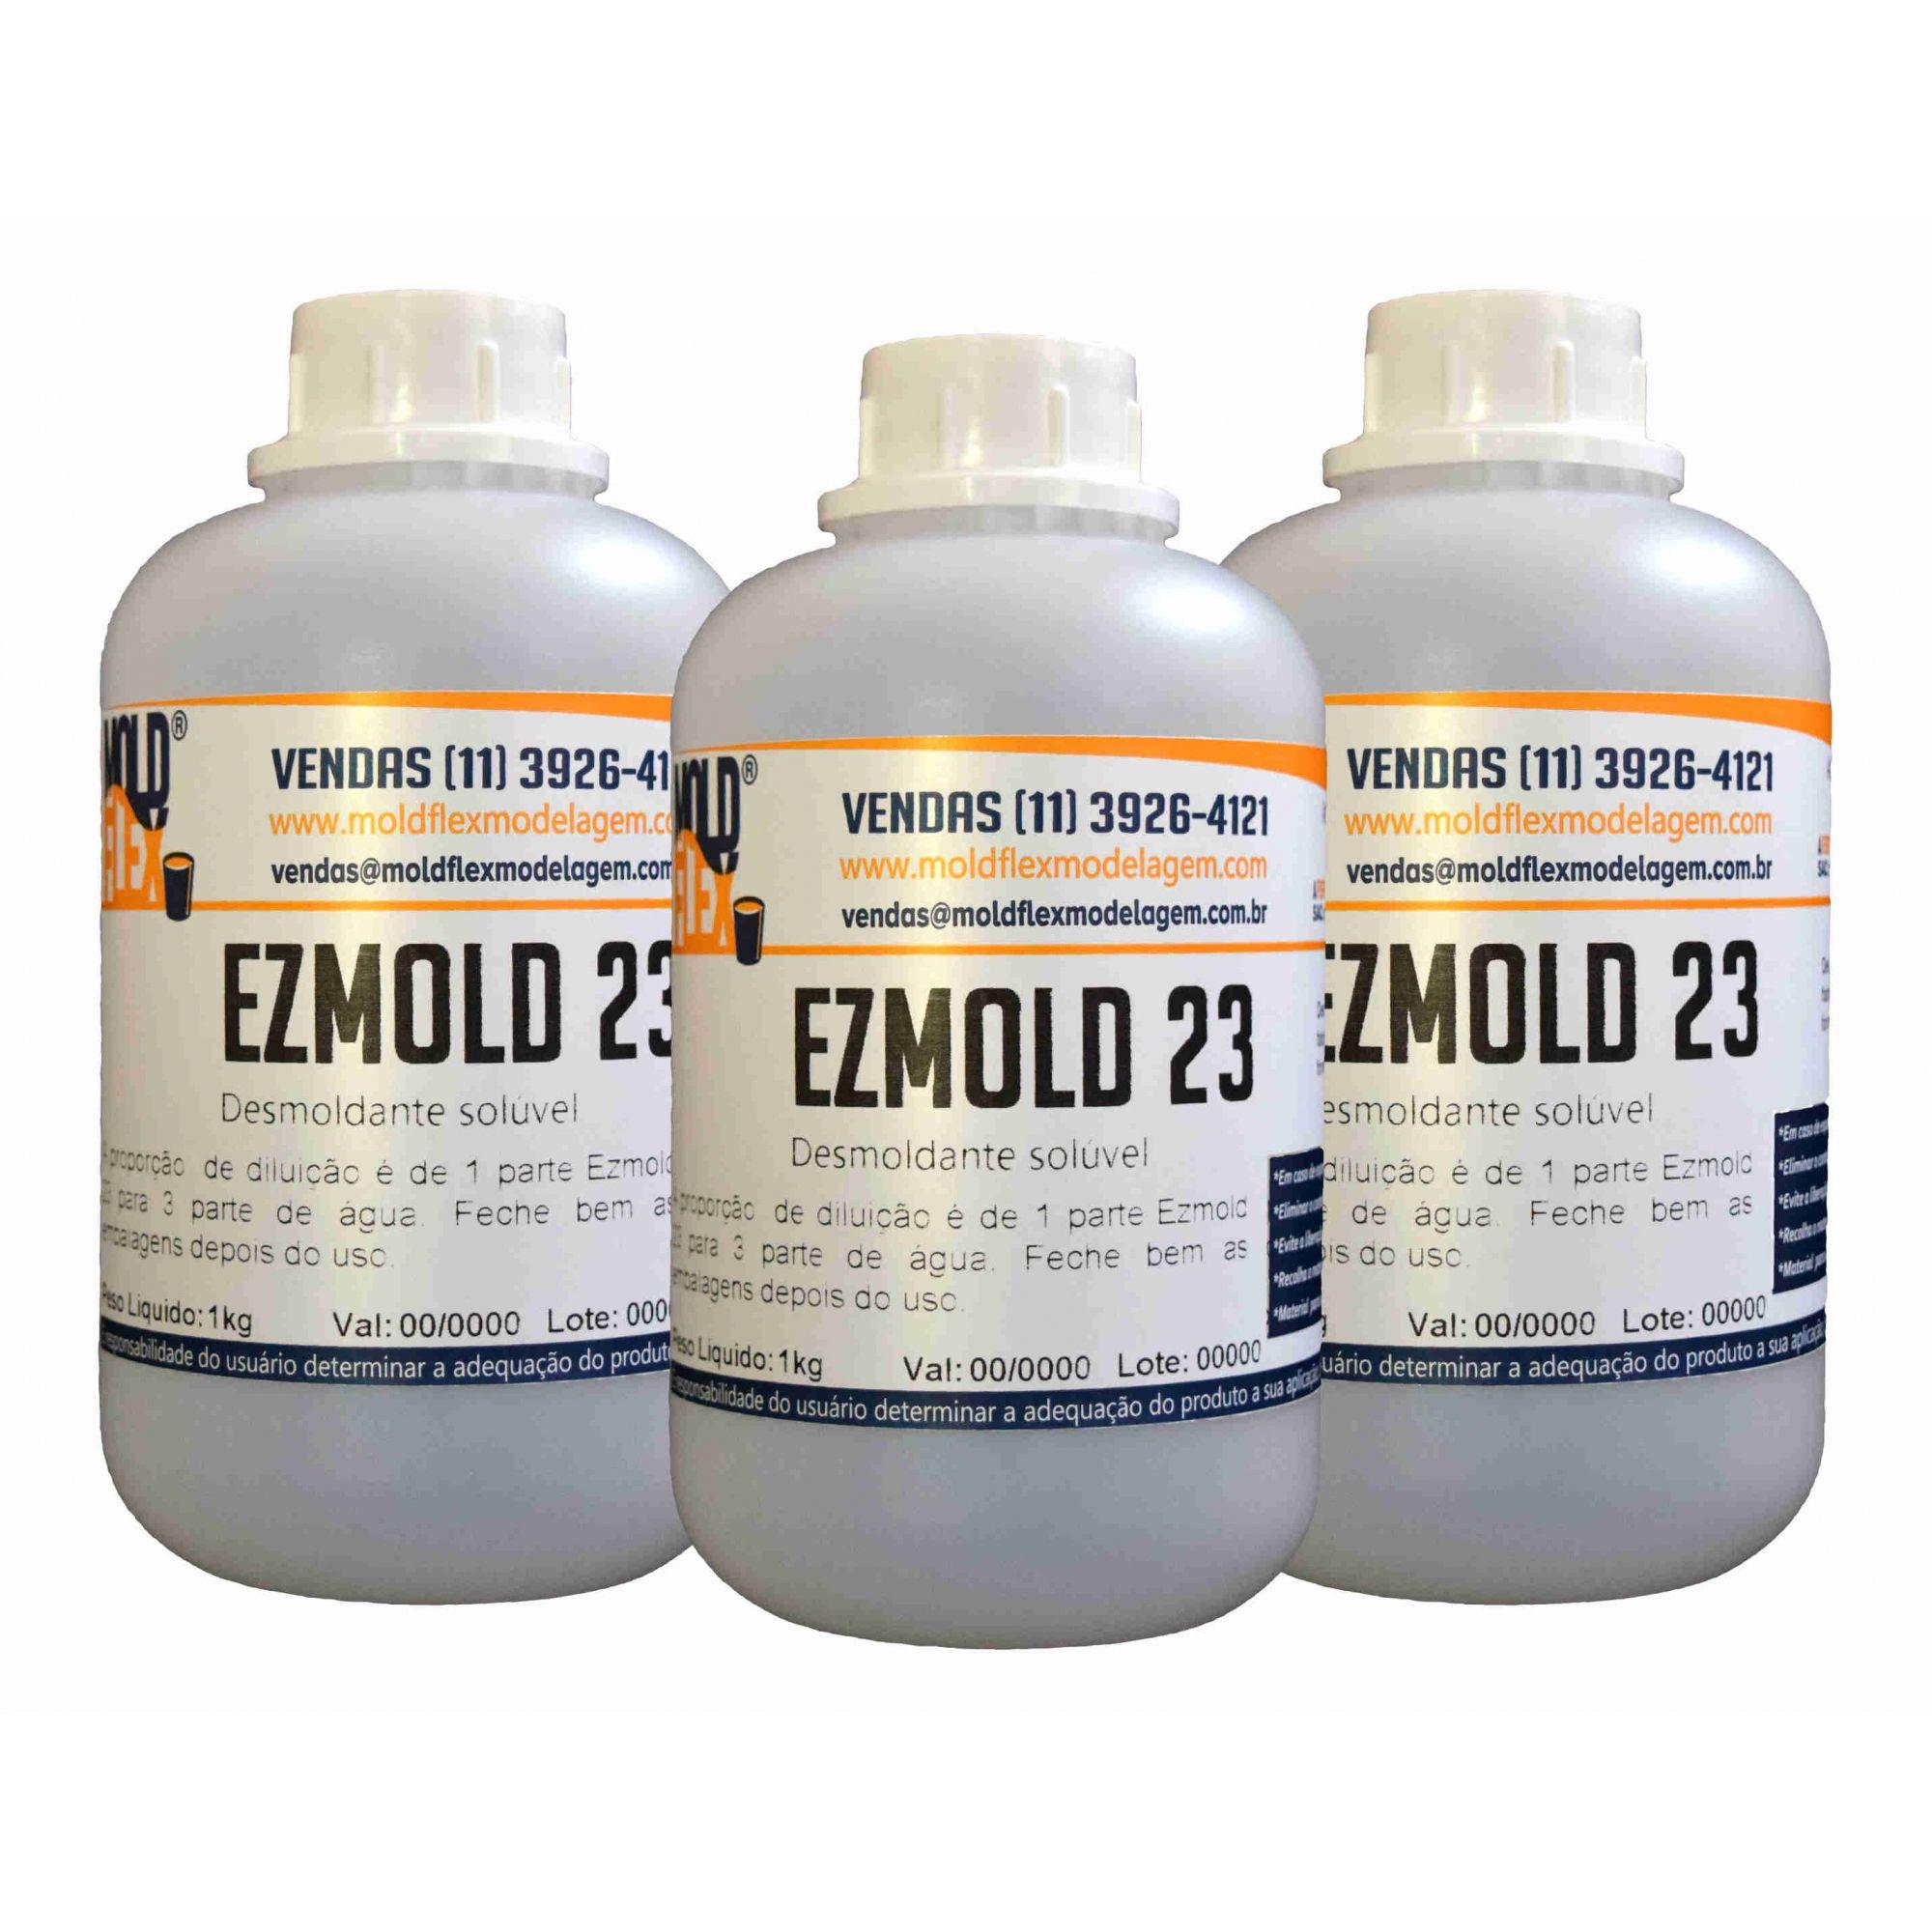 EZMOLD 23 - Desmoldante para Cimentícios